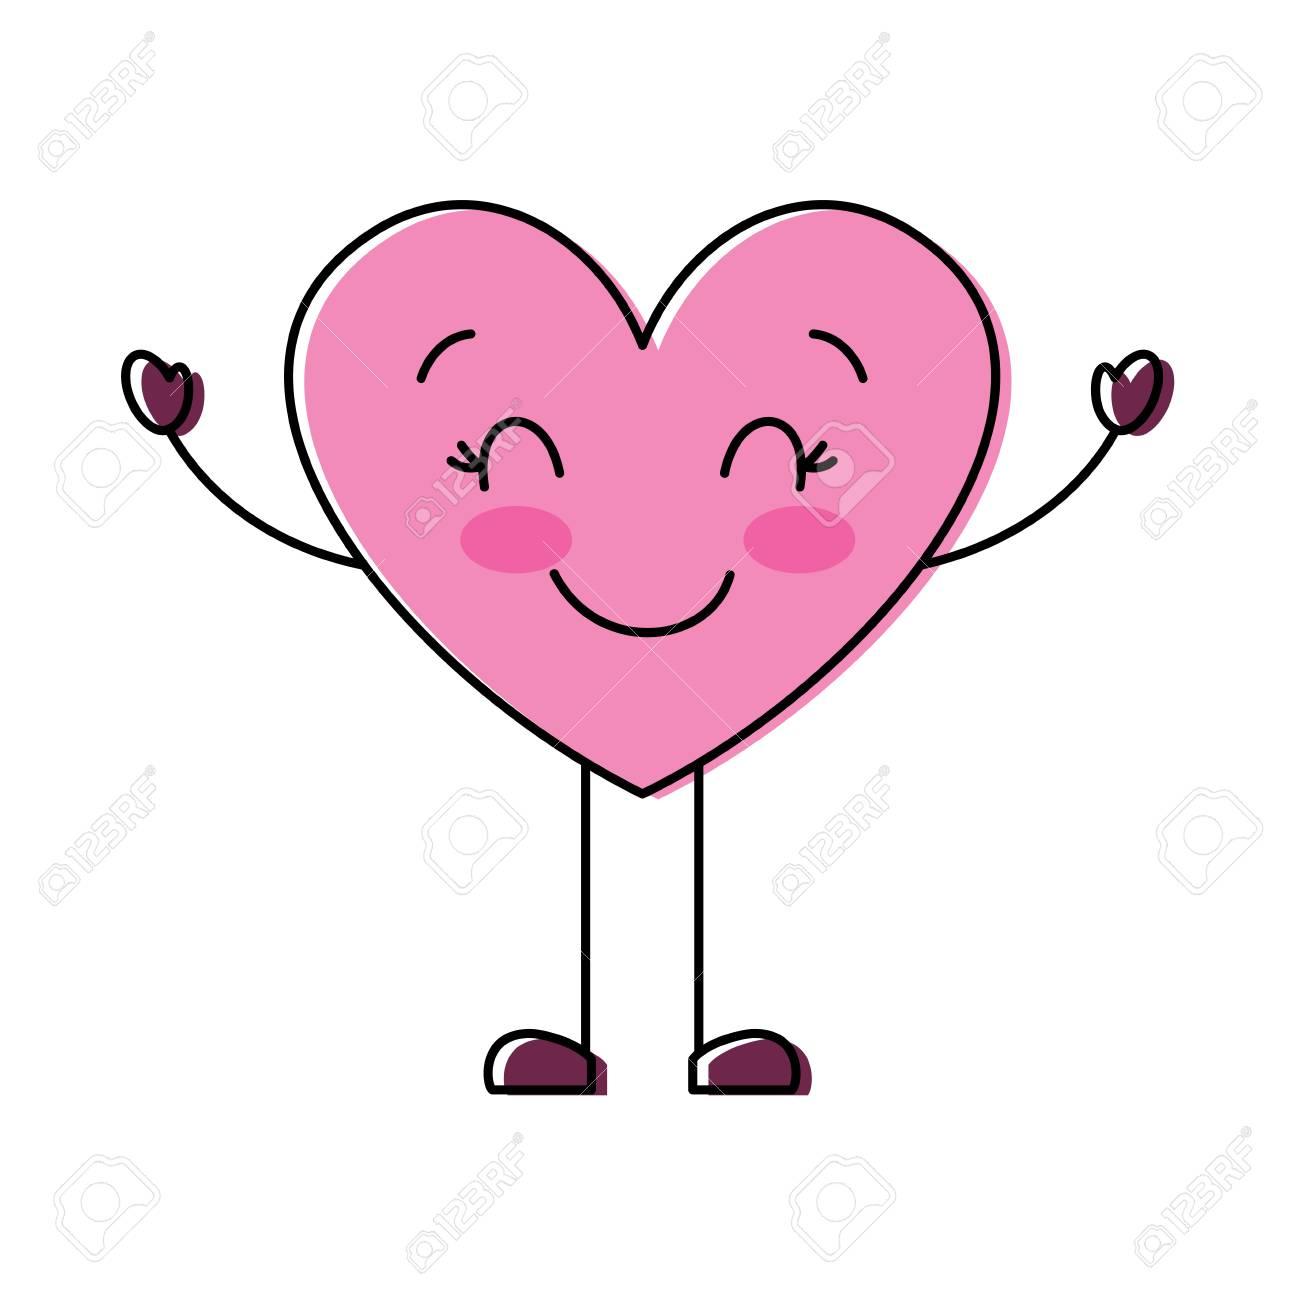 Cute Cartoon Heart Happy Character Vector Illustration Royalty ...